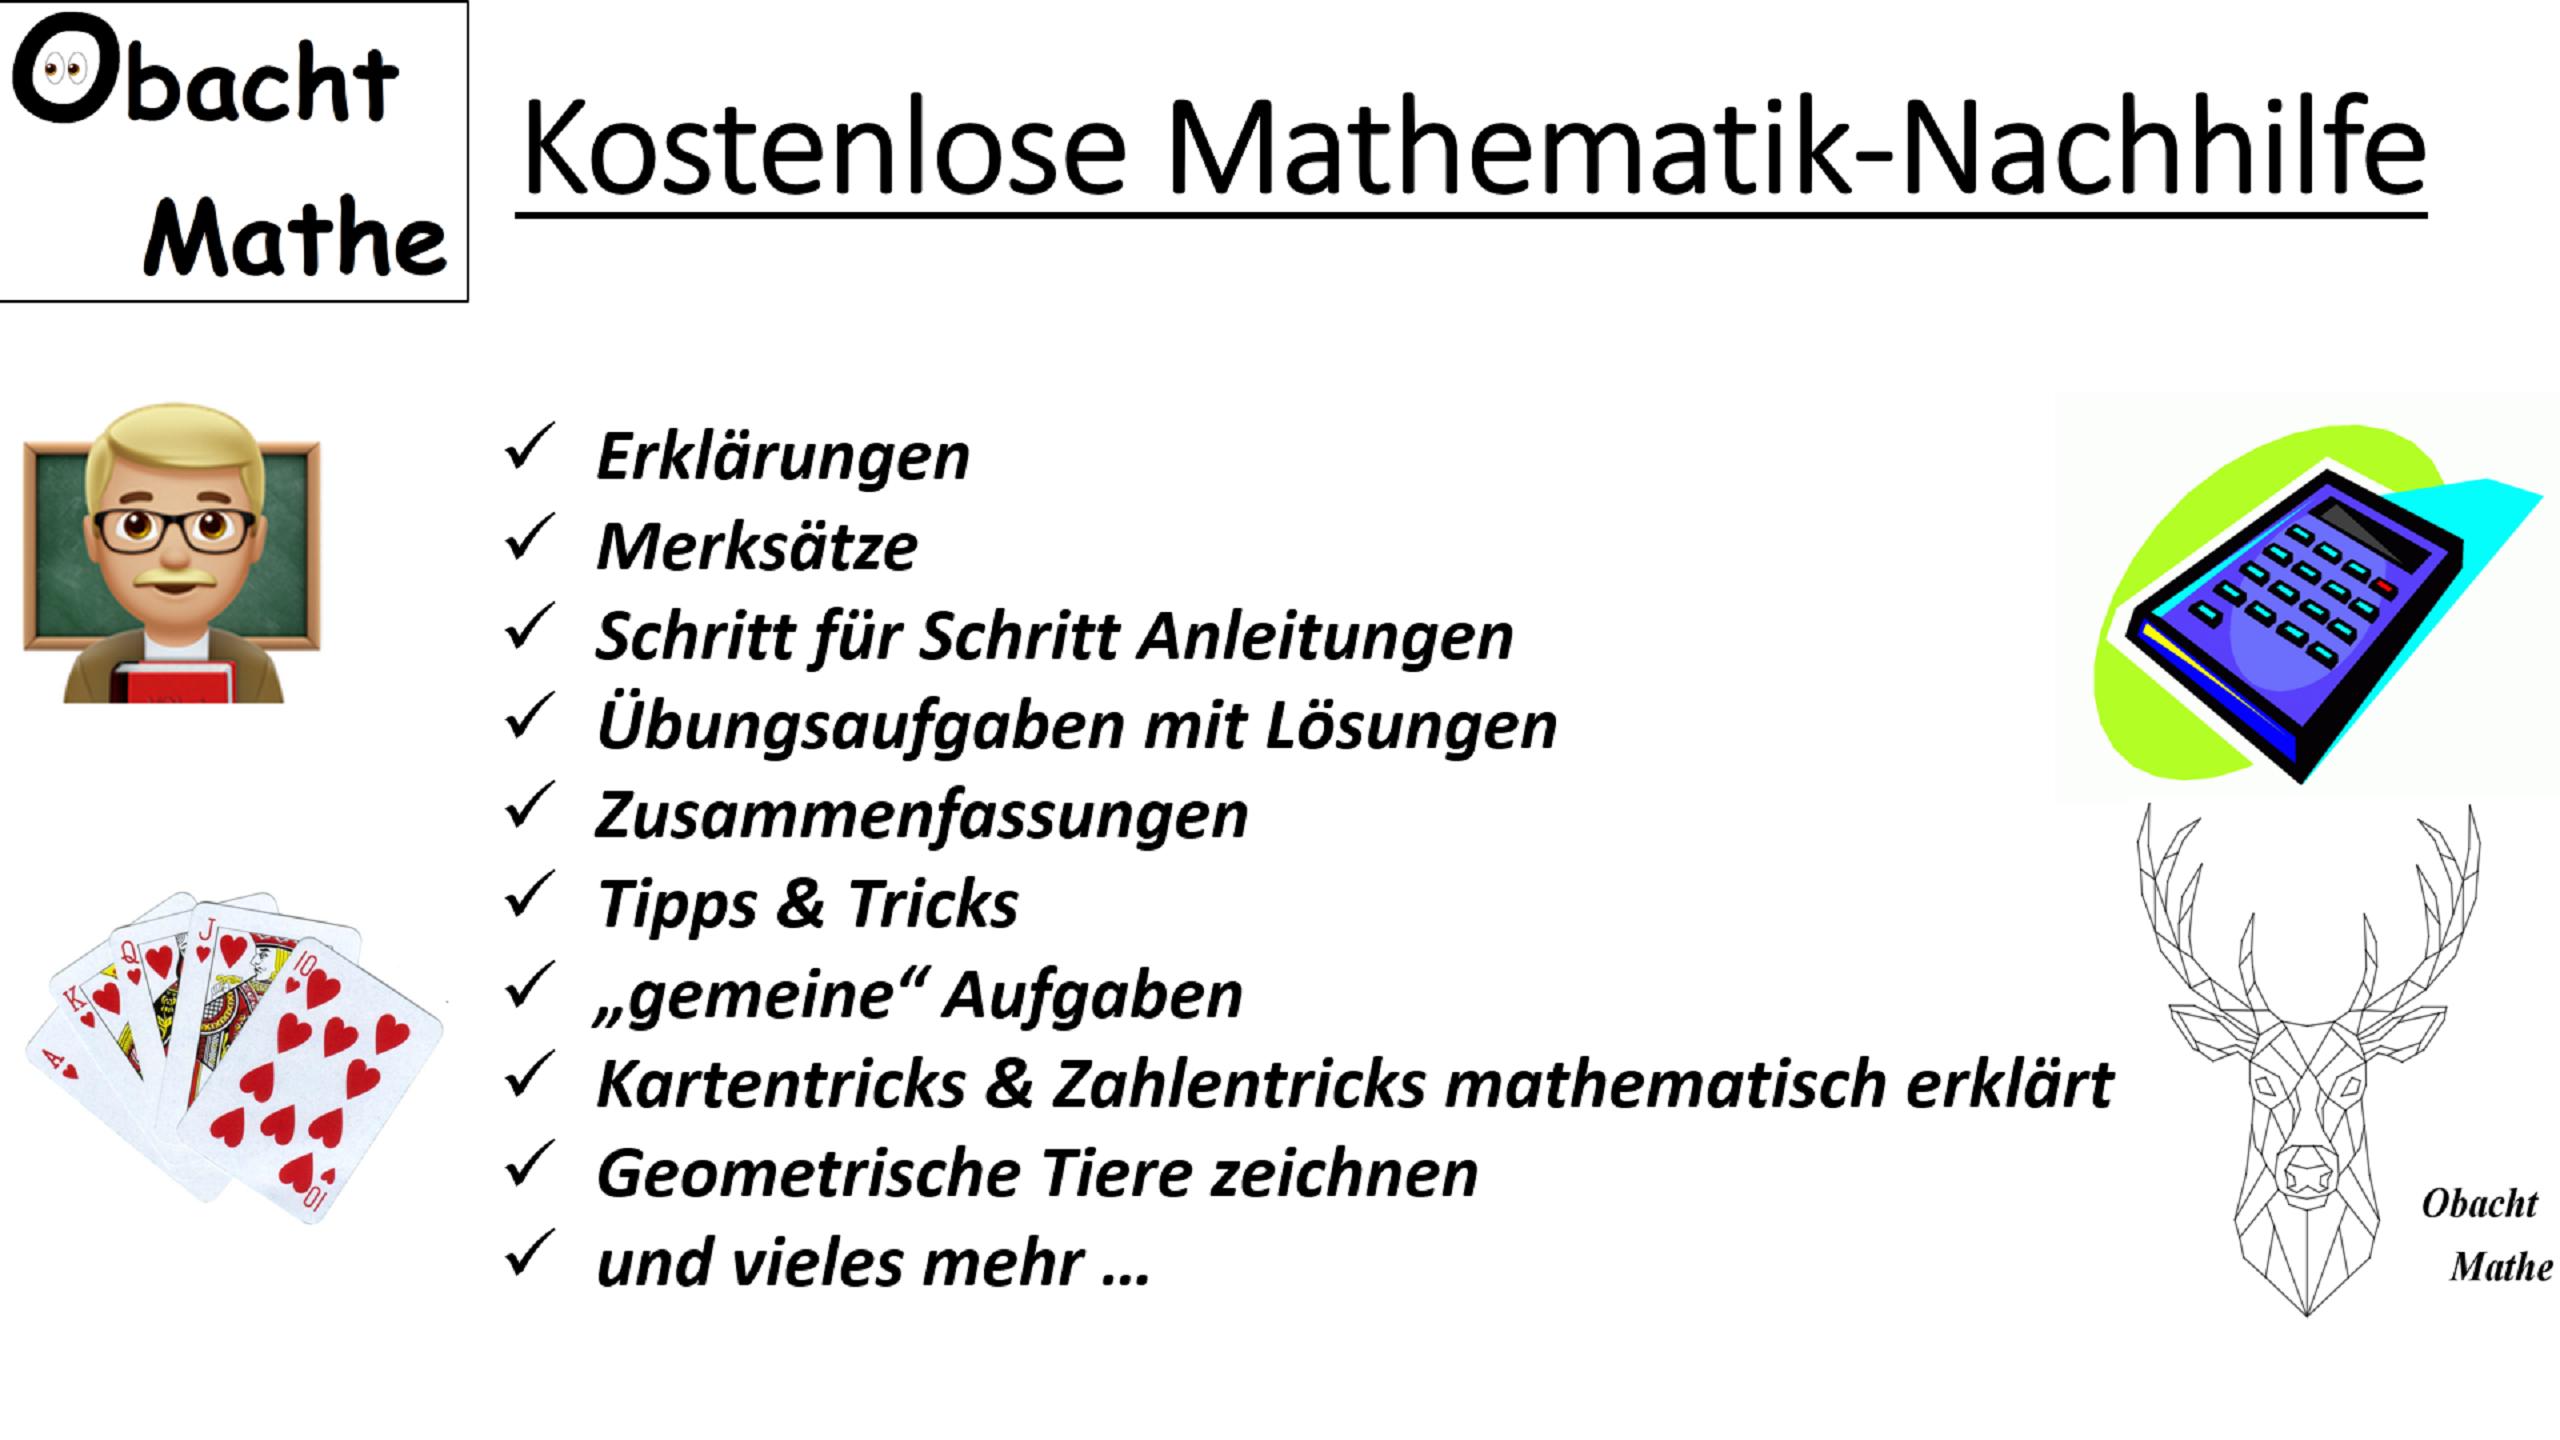 Obachtmathe Kostenlose Mathematik Nachhilfe Erklarungen Merksatze Schritt Fur Schritt Anleitungen Ubungsaufgaben Mit Nachhilfe Mathe Mathe Mathematik